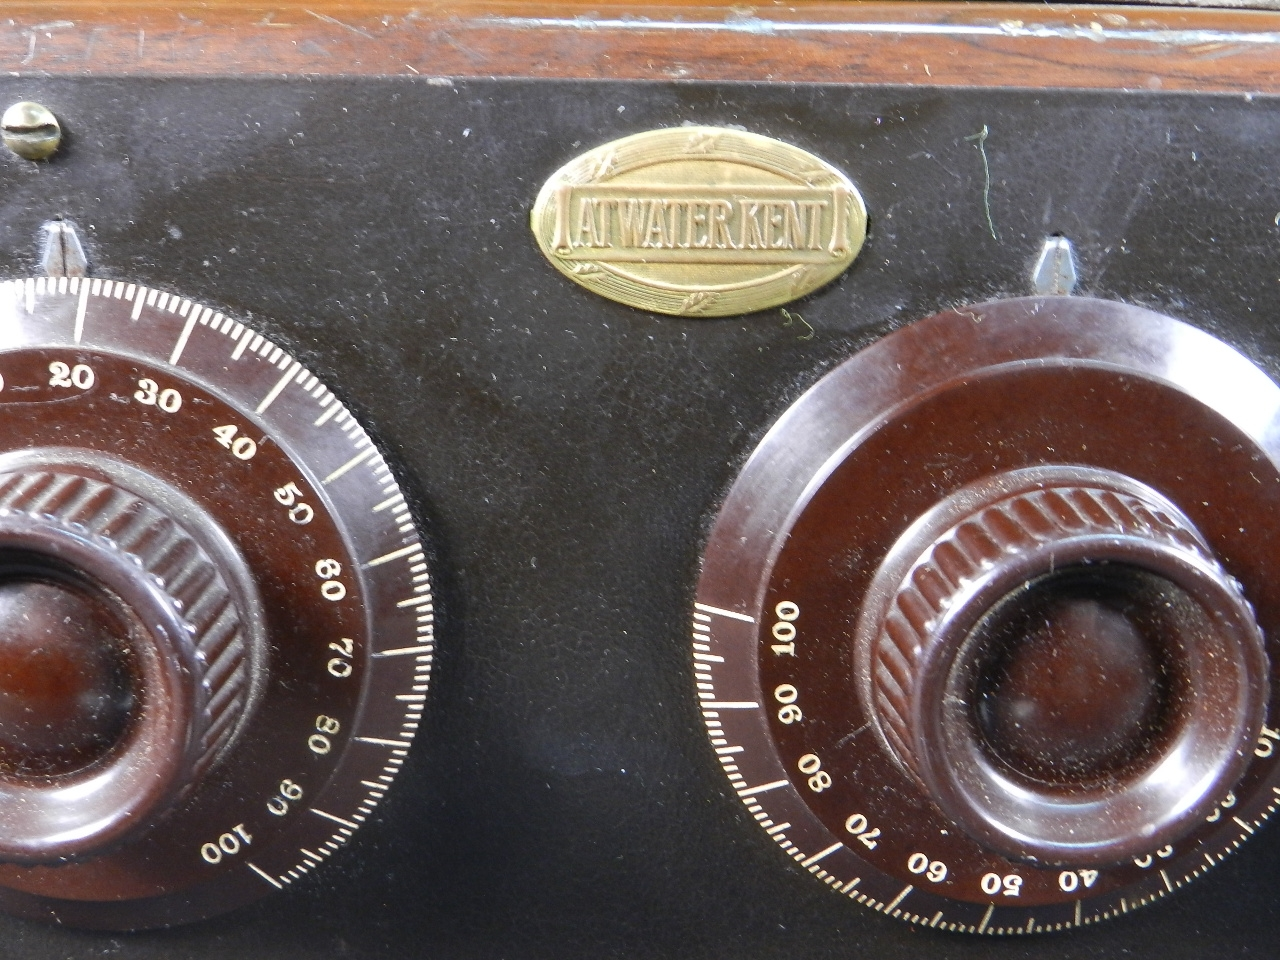 Imagen RADIO ATWATER KENT MODELO 20 + SPEAKER Mod.E 33069